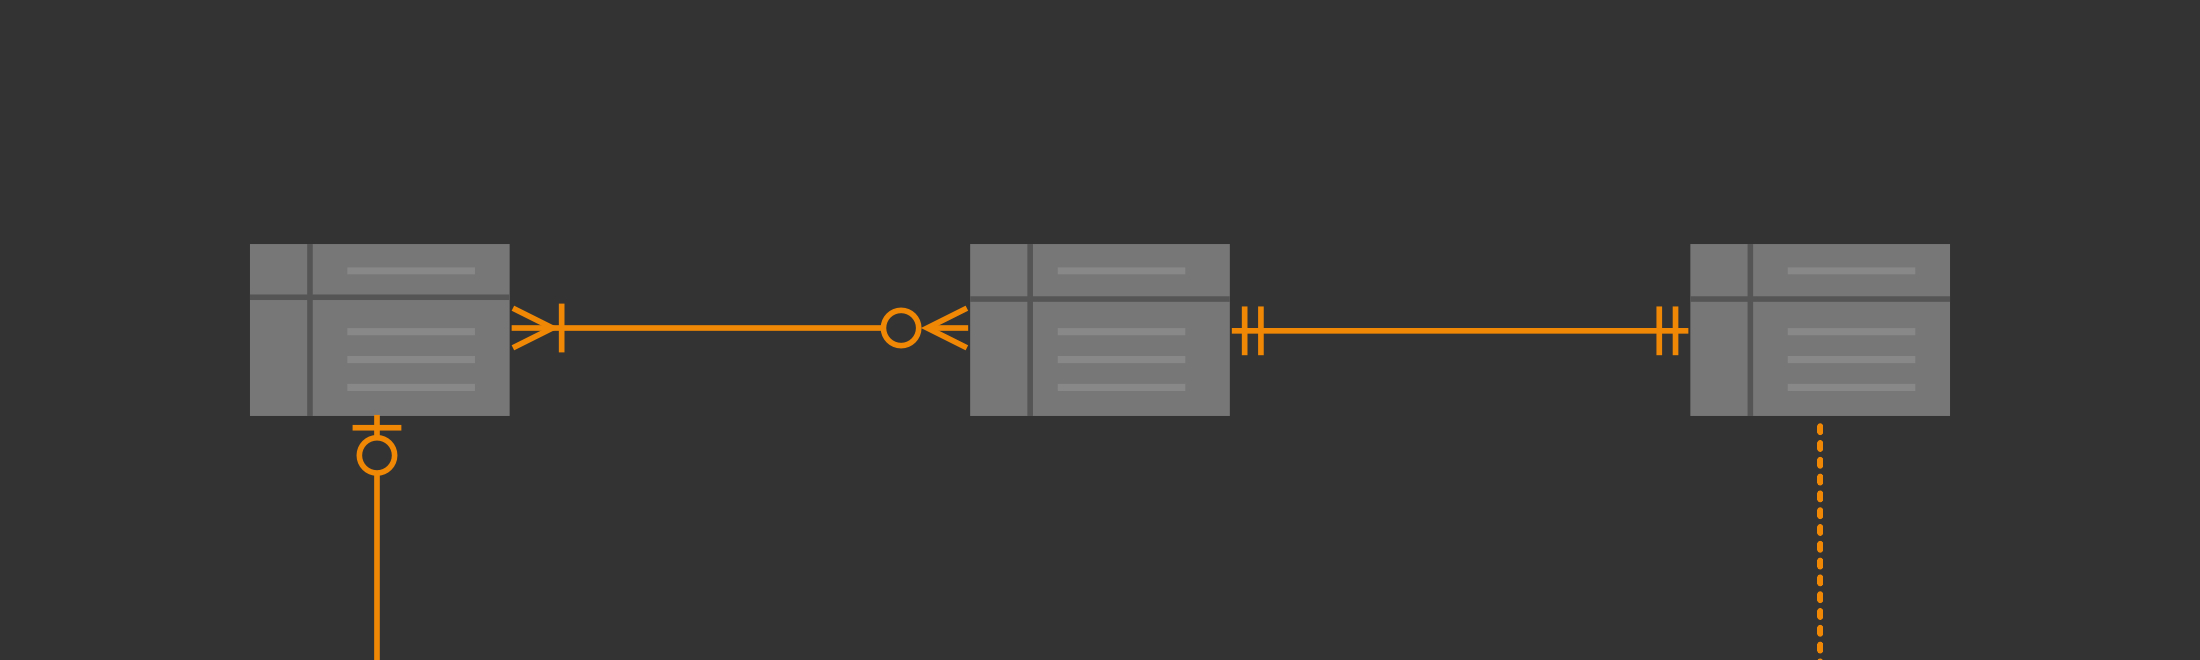 Entity Relationship Diagrams With Draw.io – Draw.io with regard to Er Diagram Ke Tabel